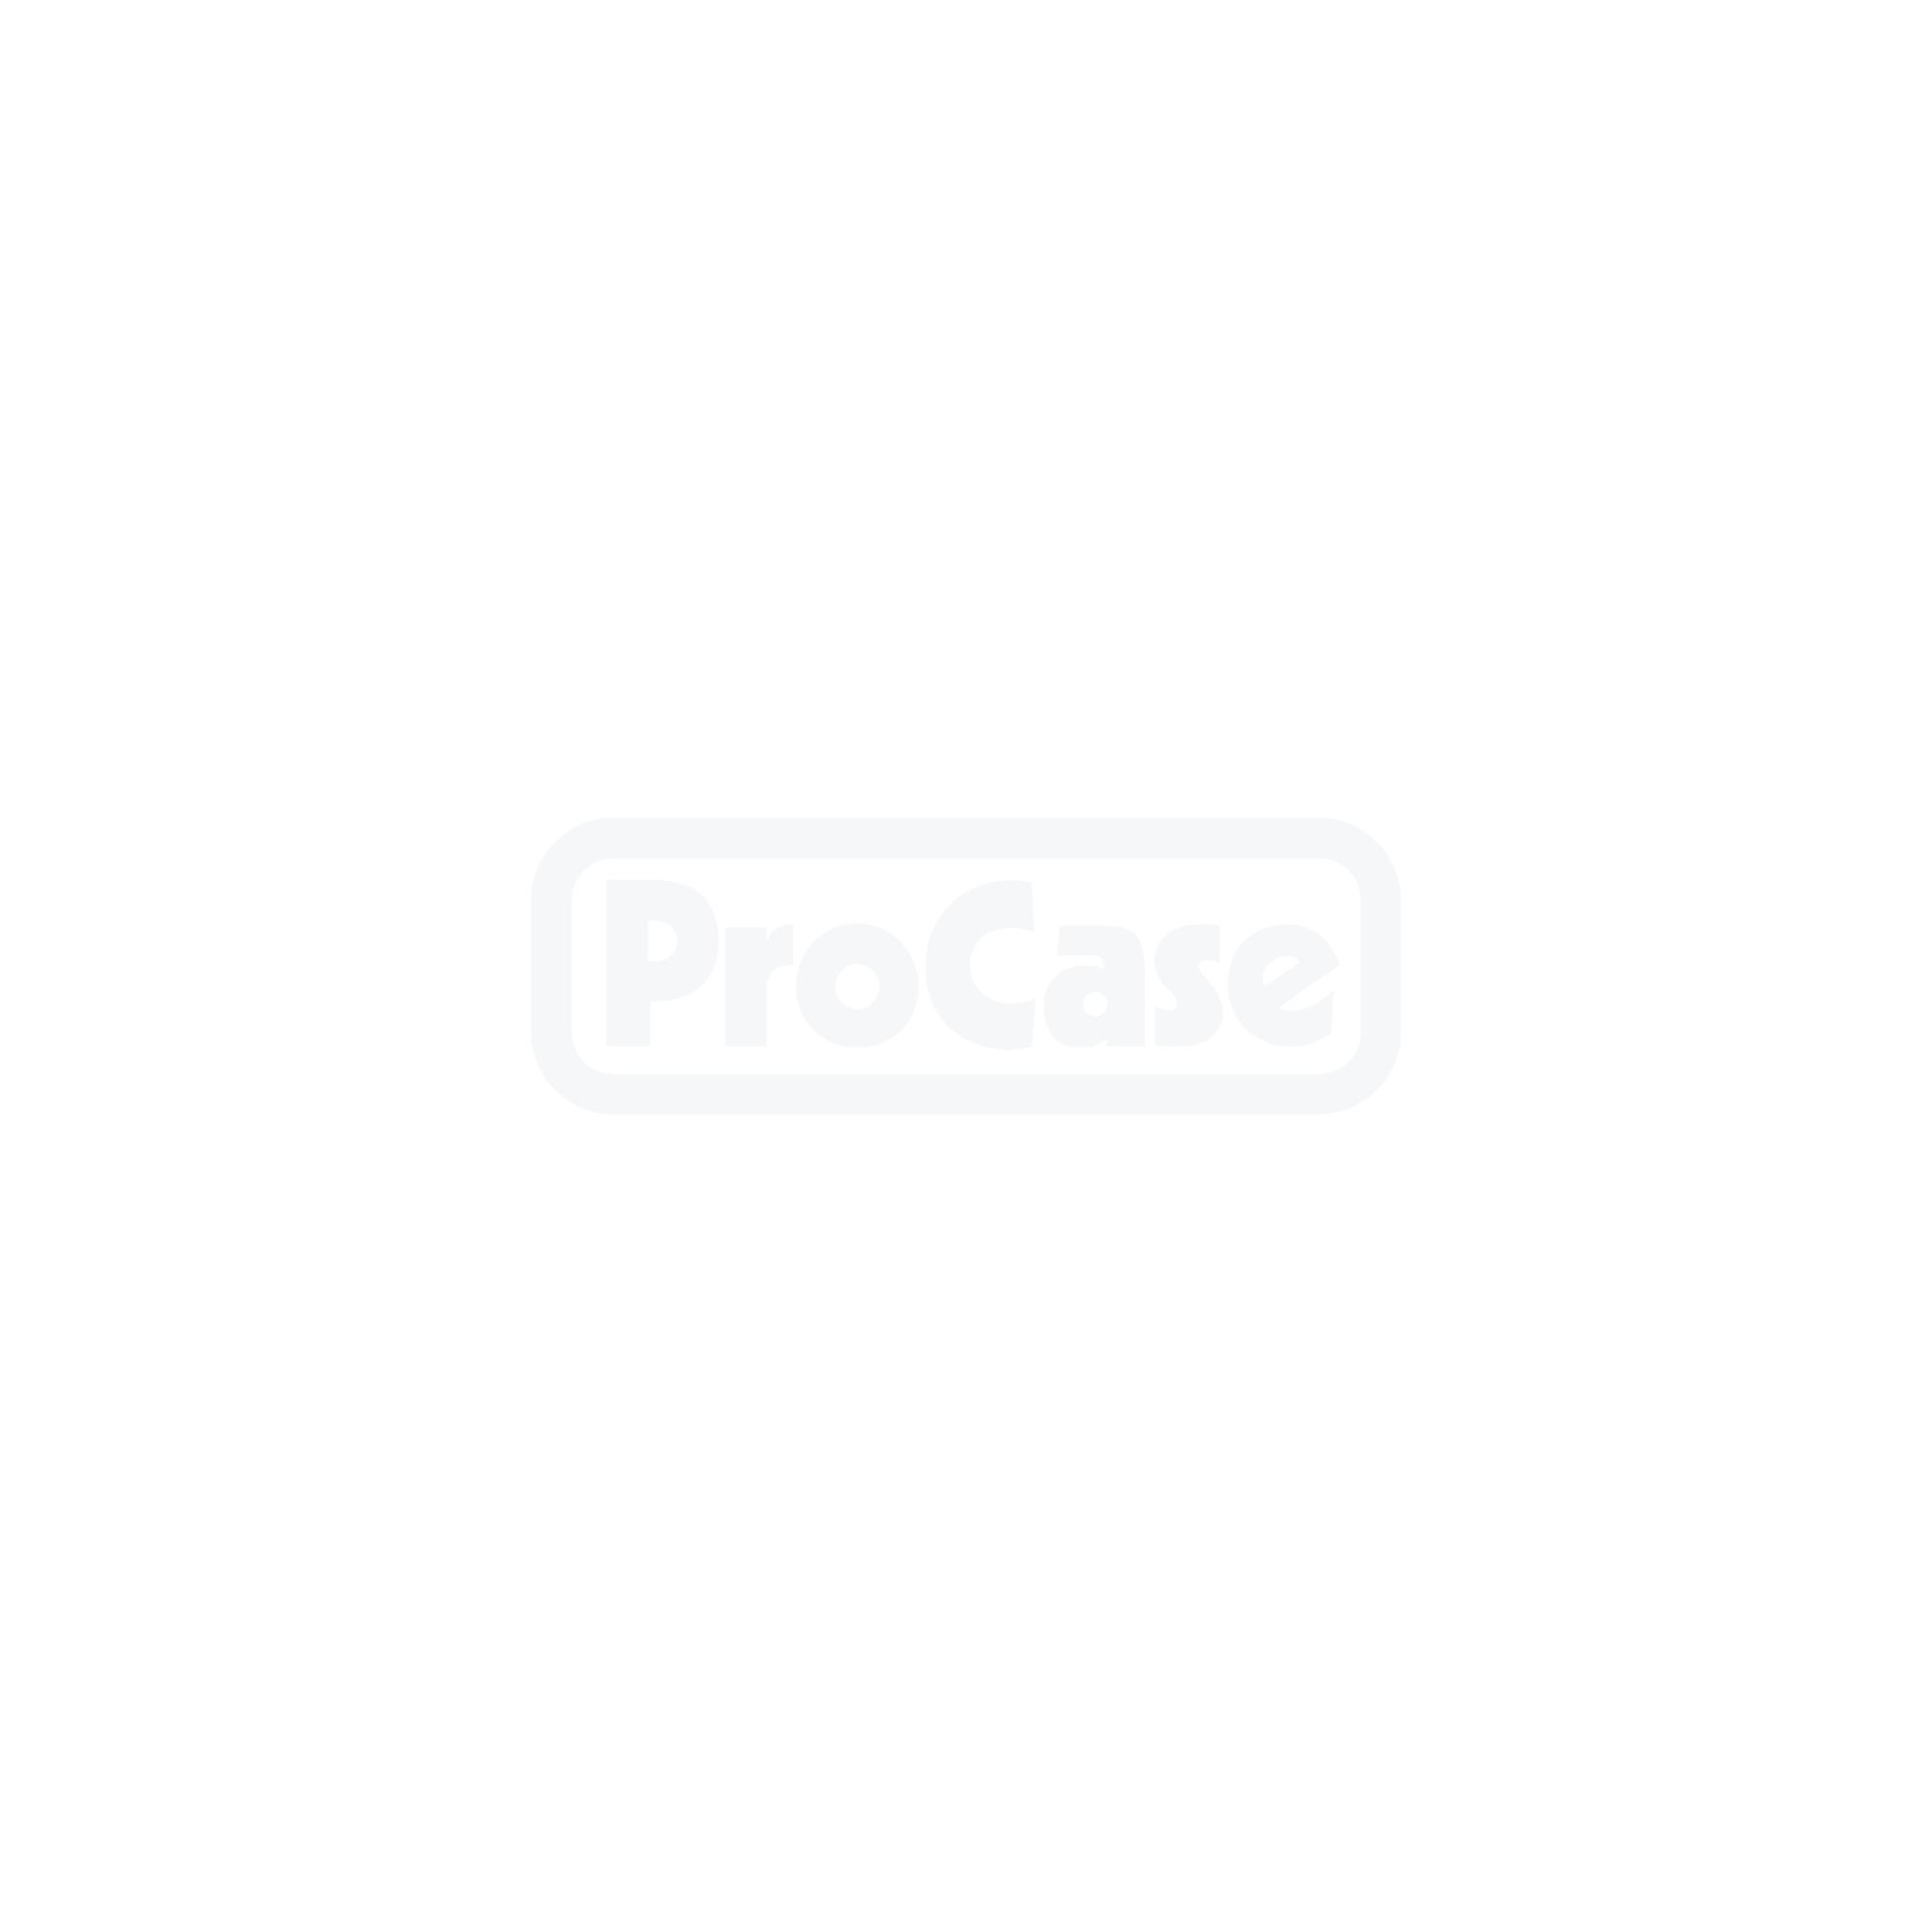 ProCase TourLabel Produktions-Schild selbstklebend